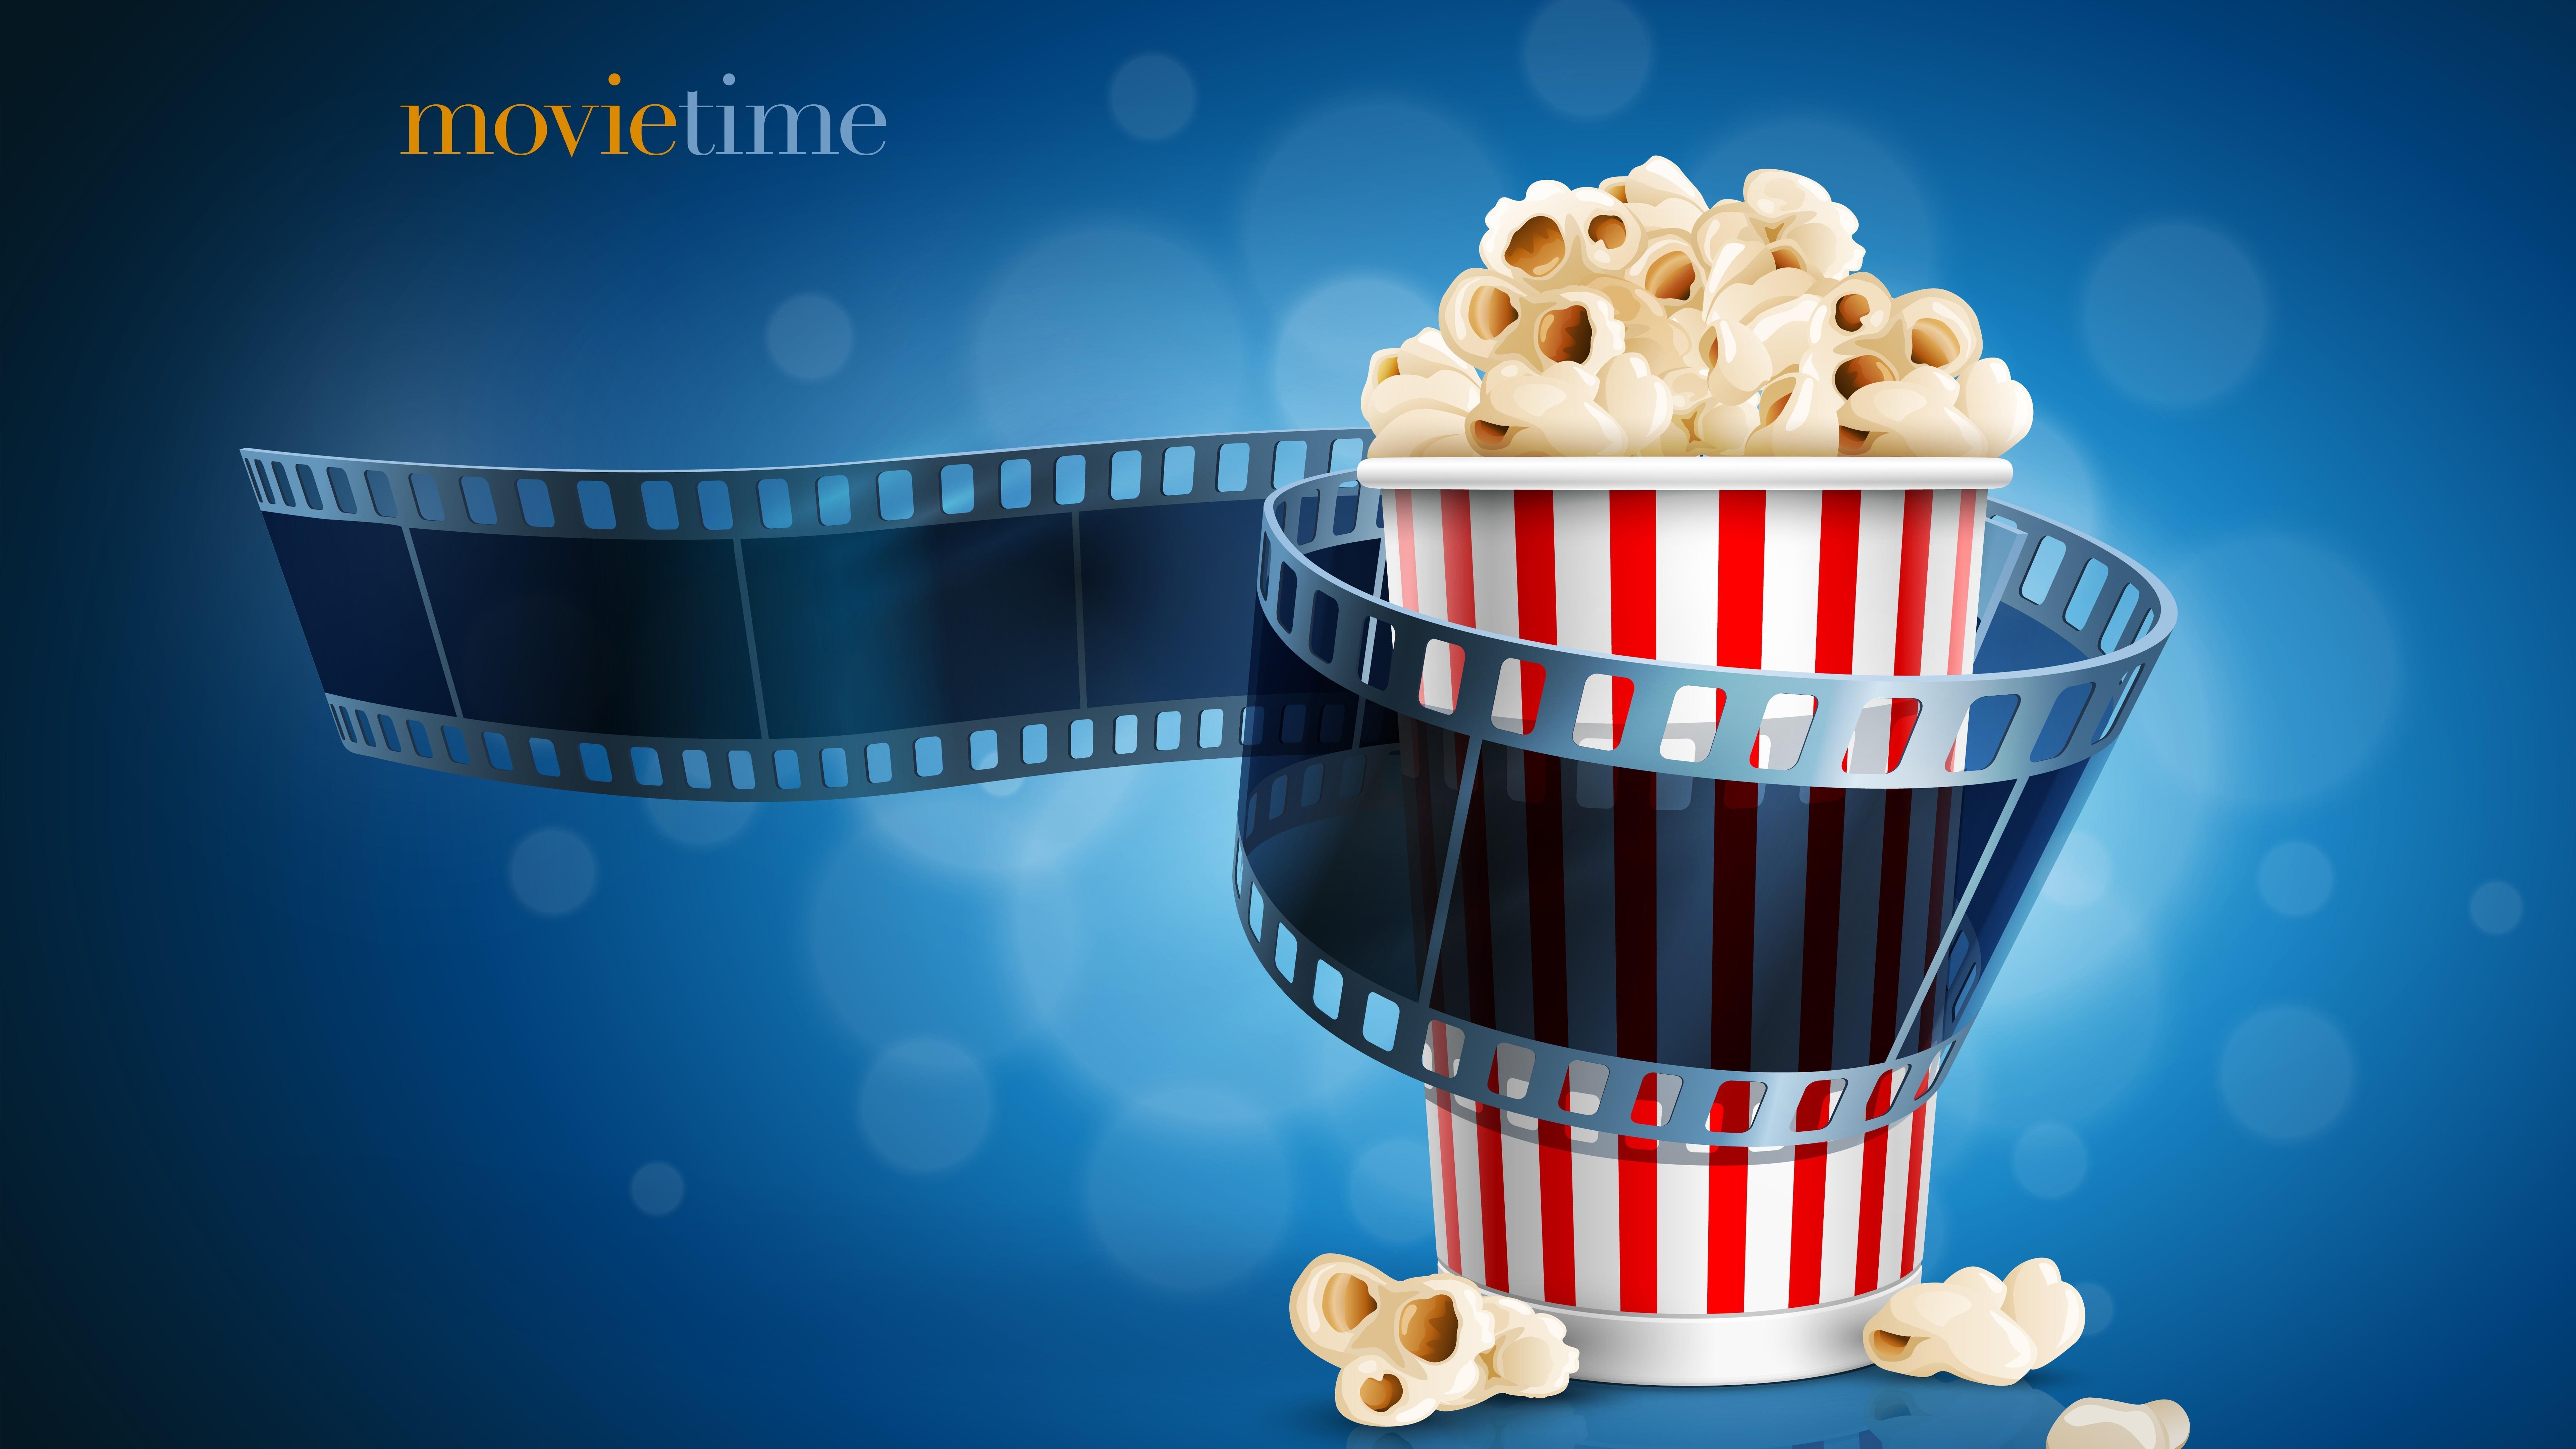 Movietime wallpaper